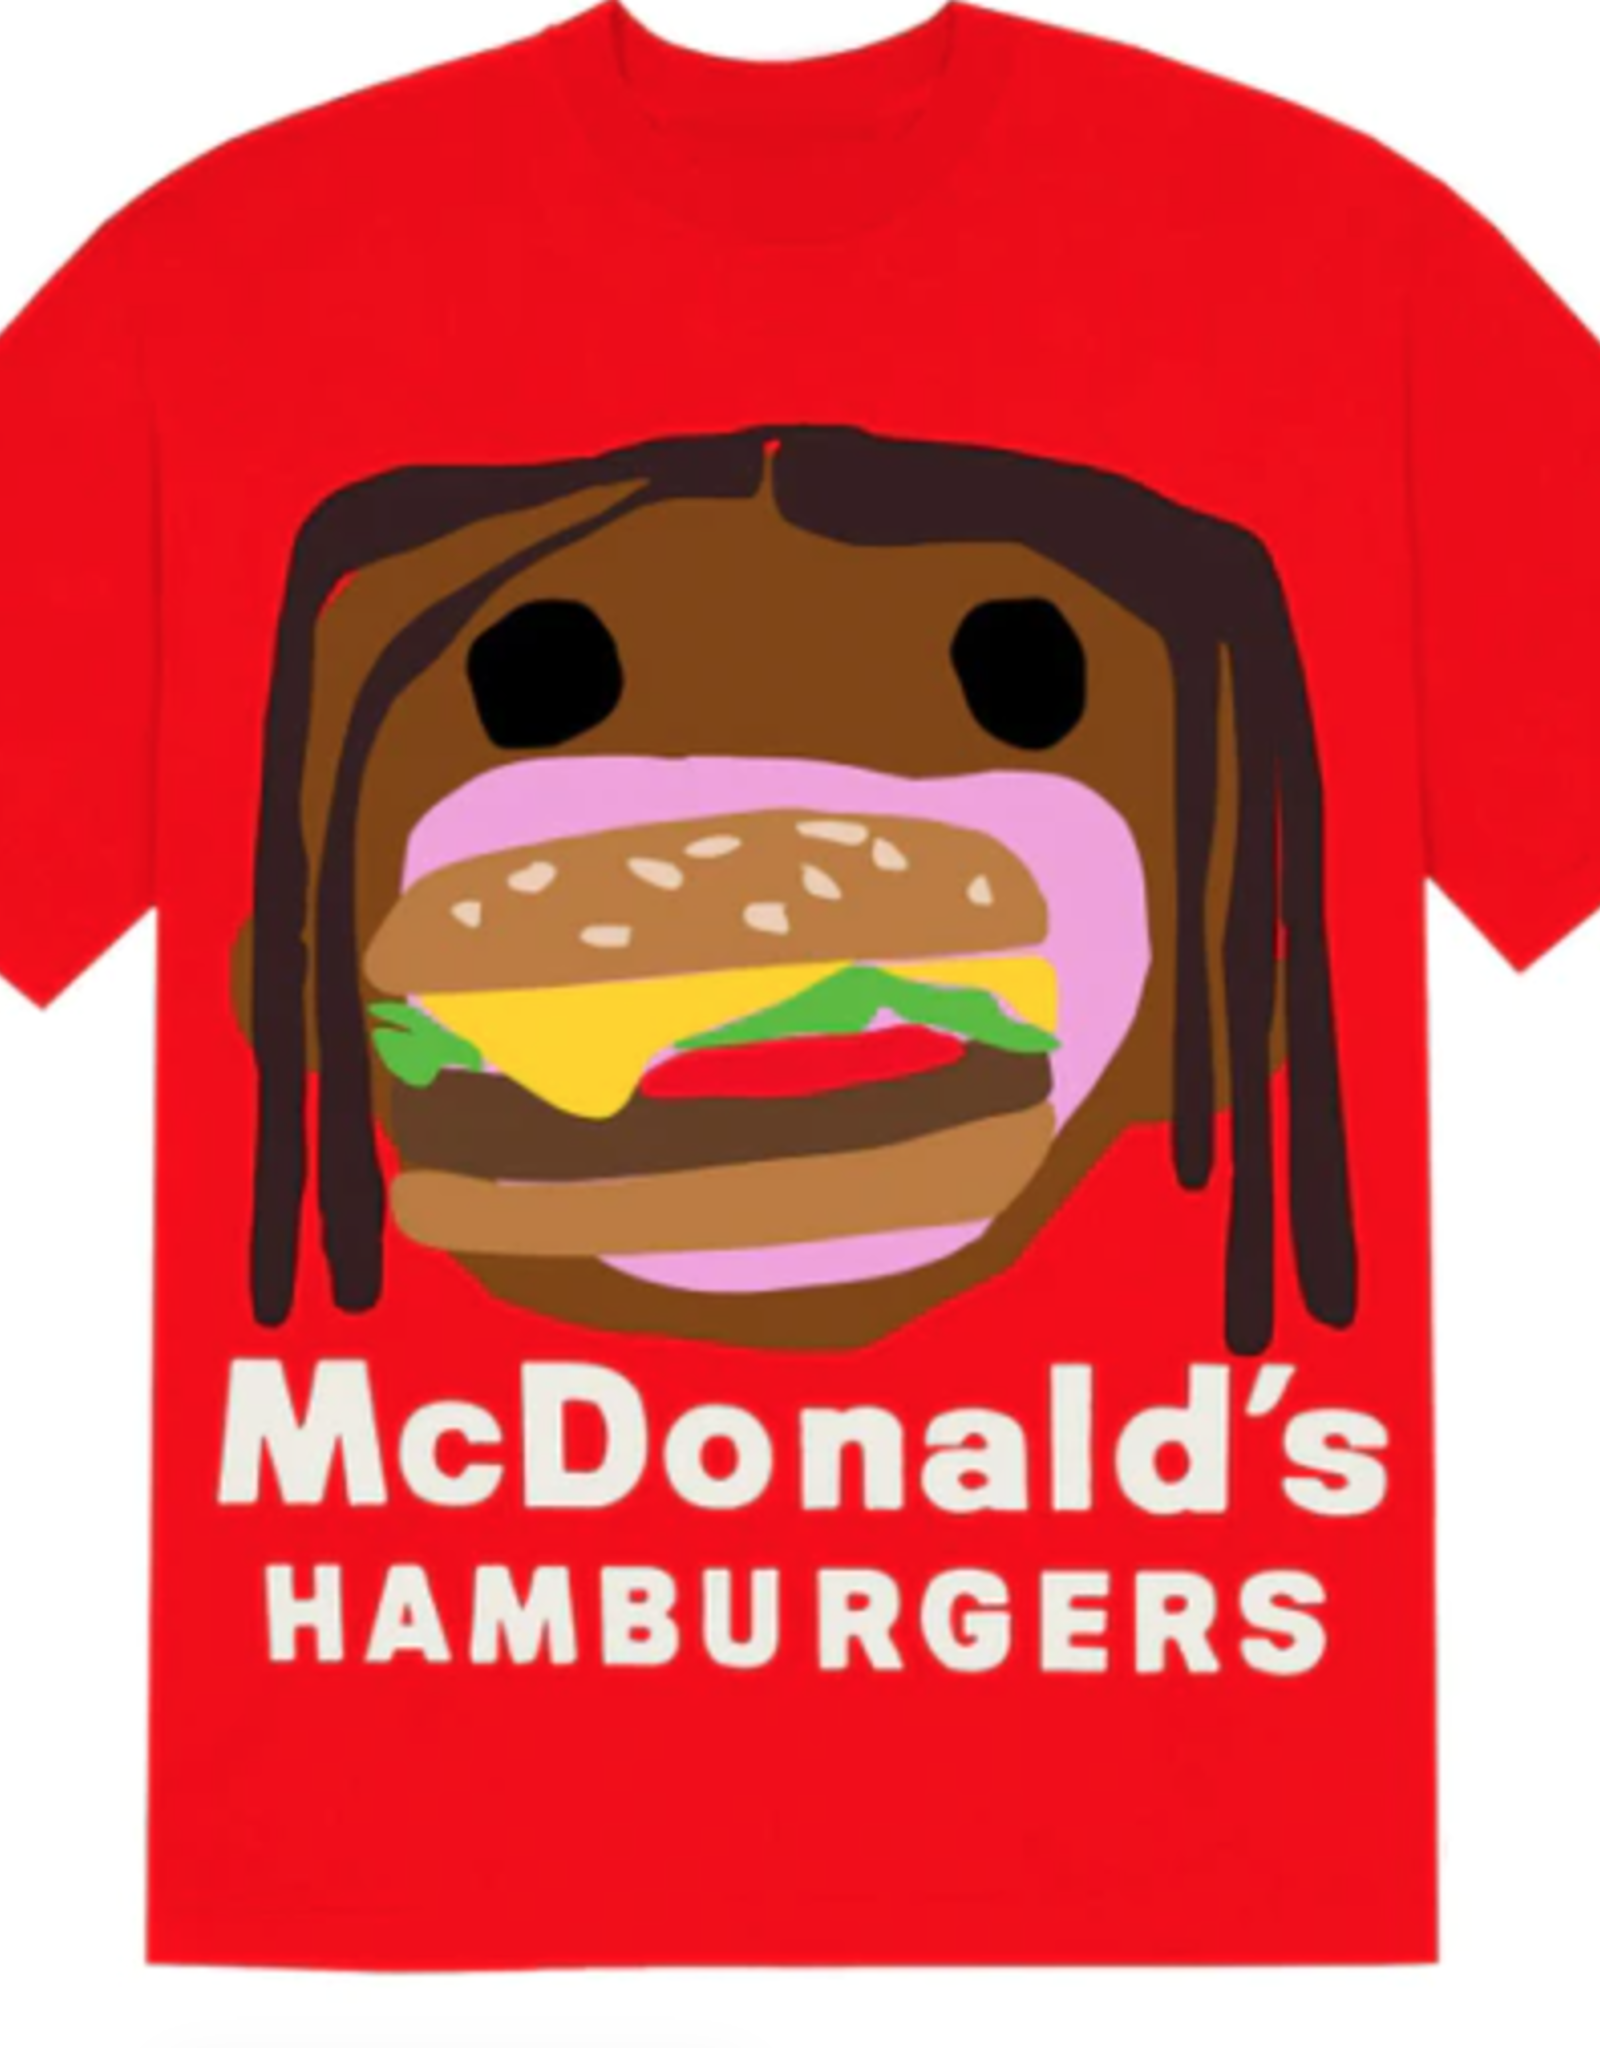 Travis Scott x CPFM 4 CJ Burger Mouth T-Shirt Red - Large